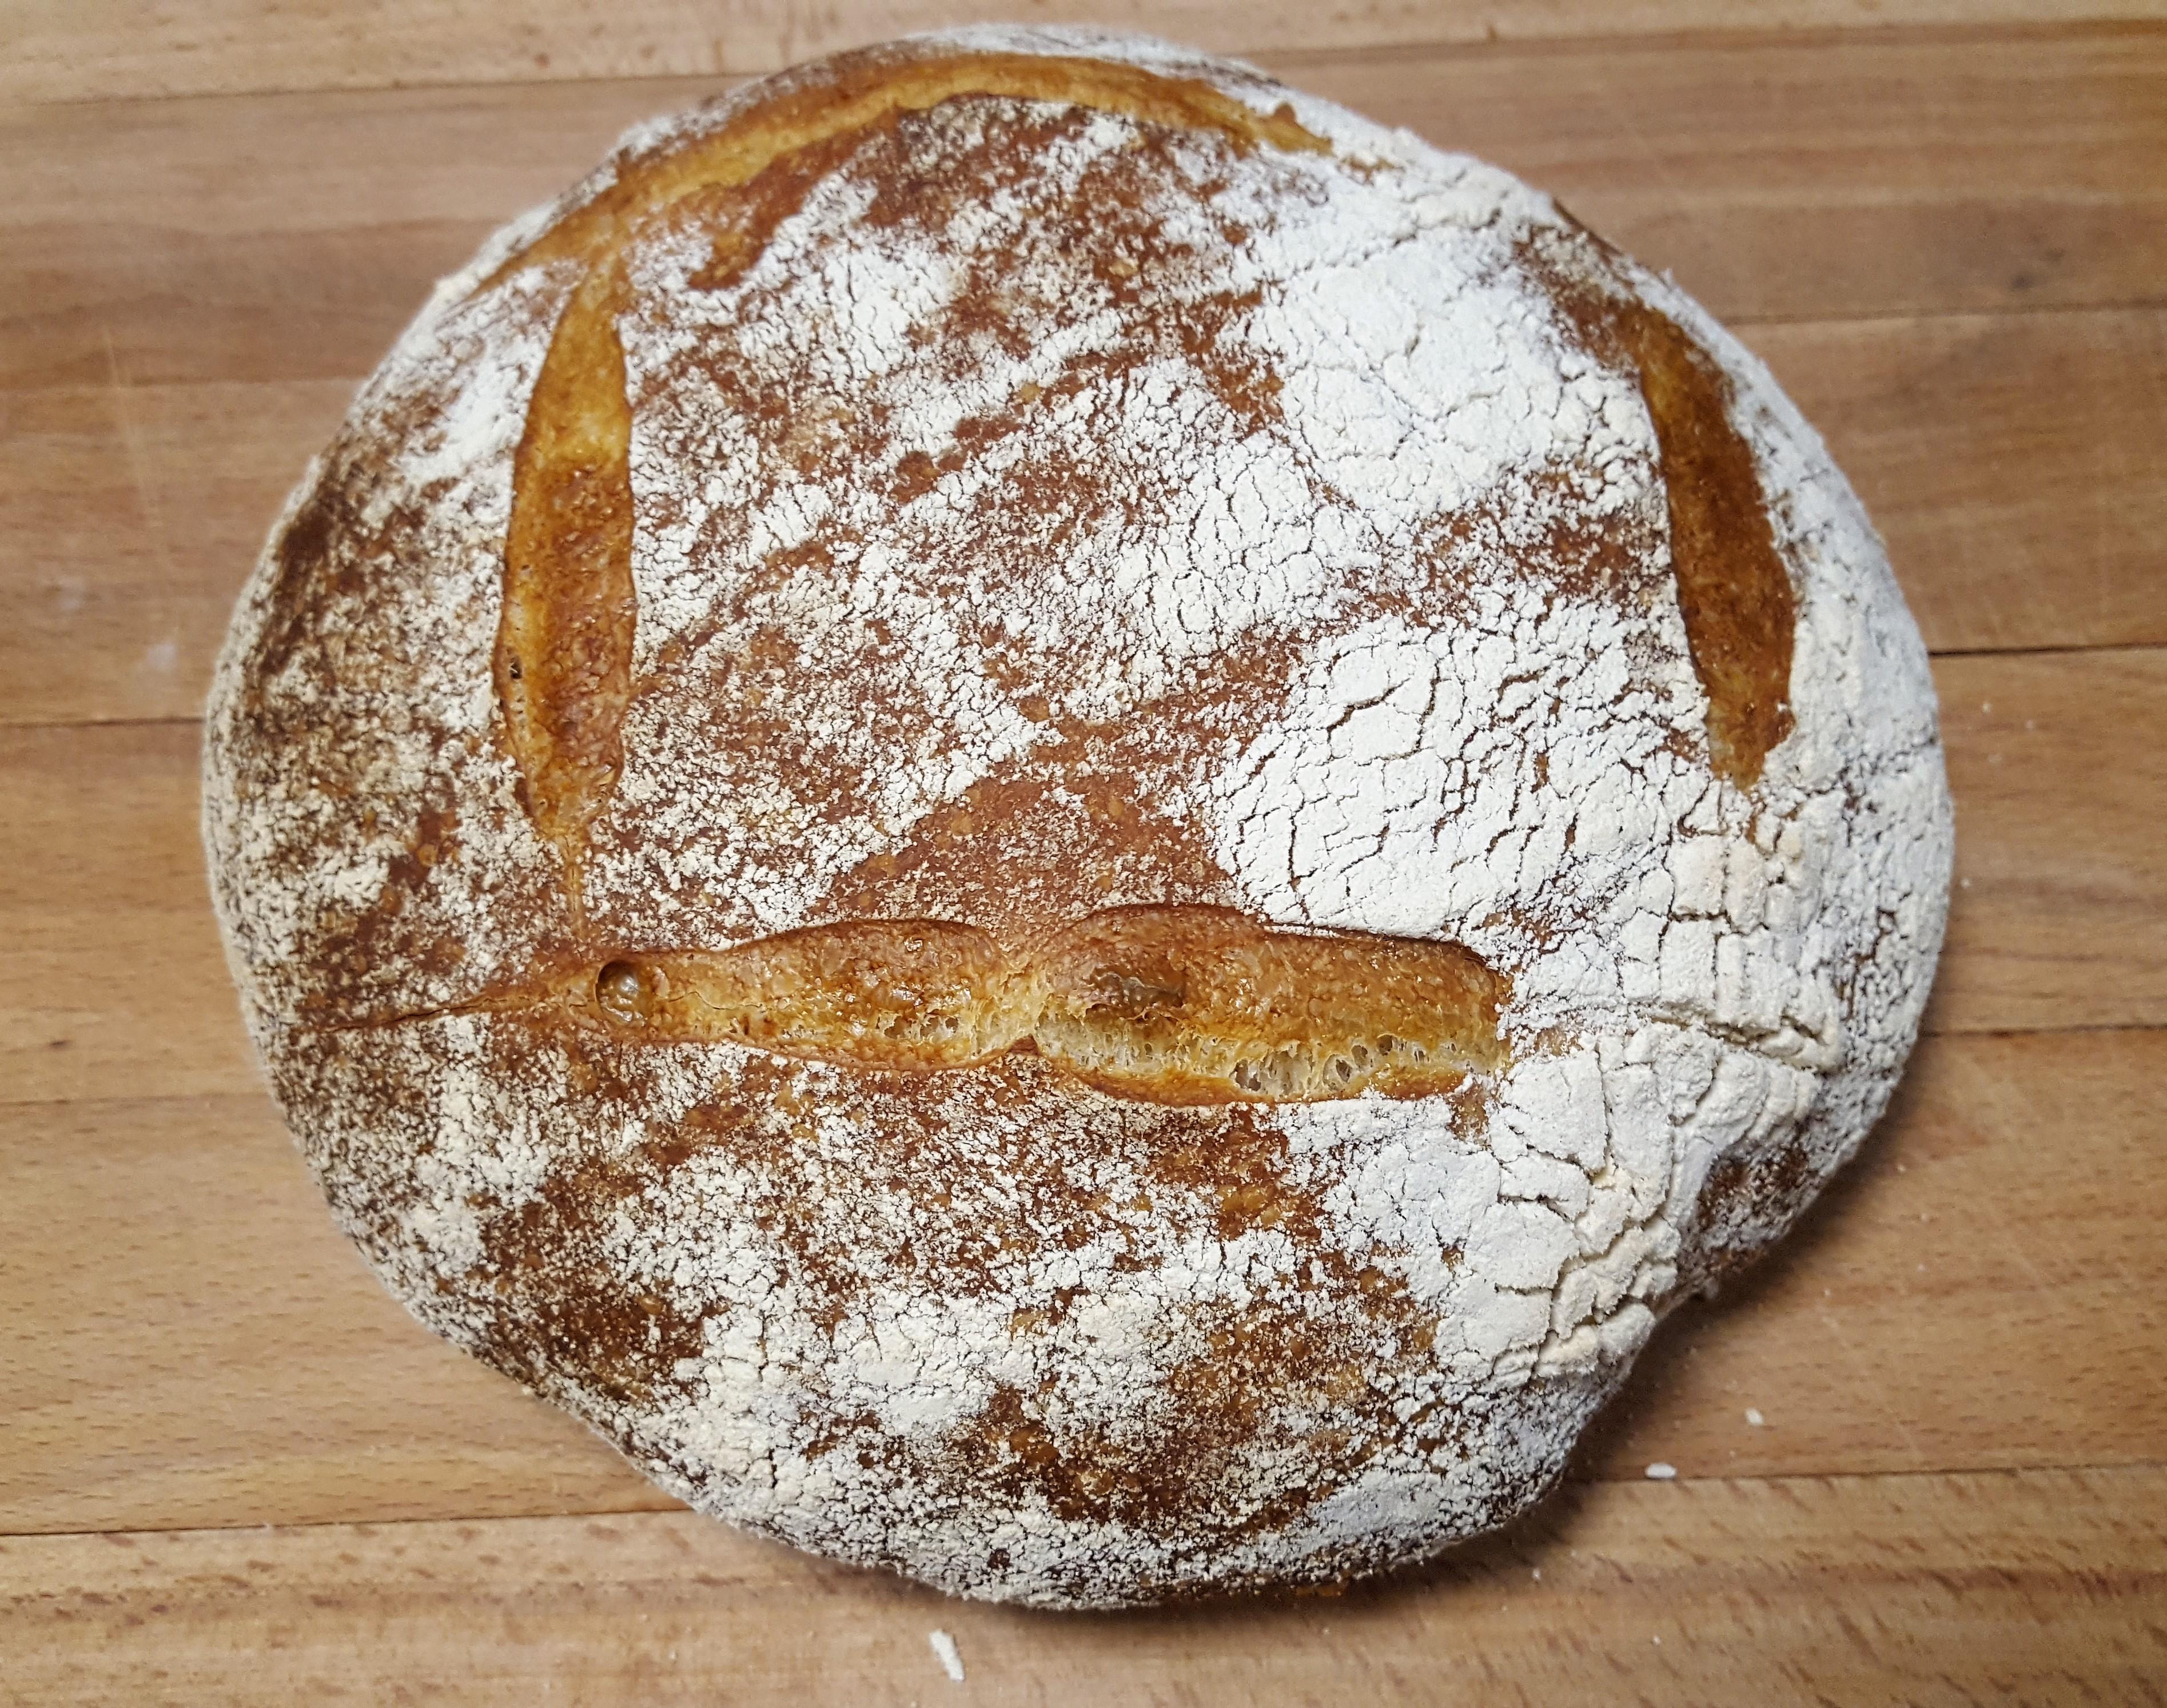 Sourdough Starter and Homemade Sourdough Bread